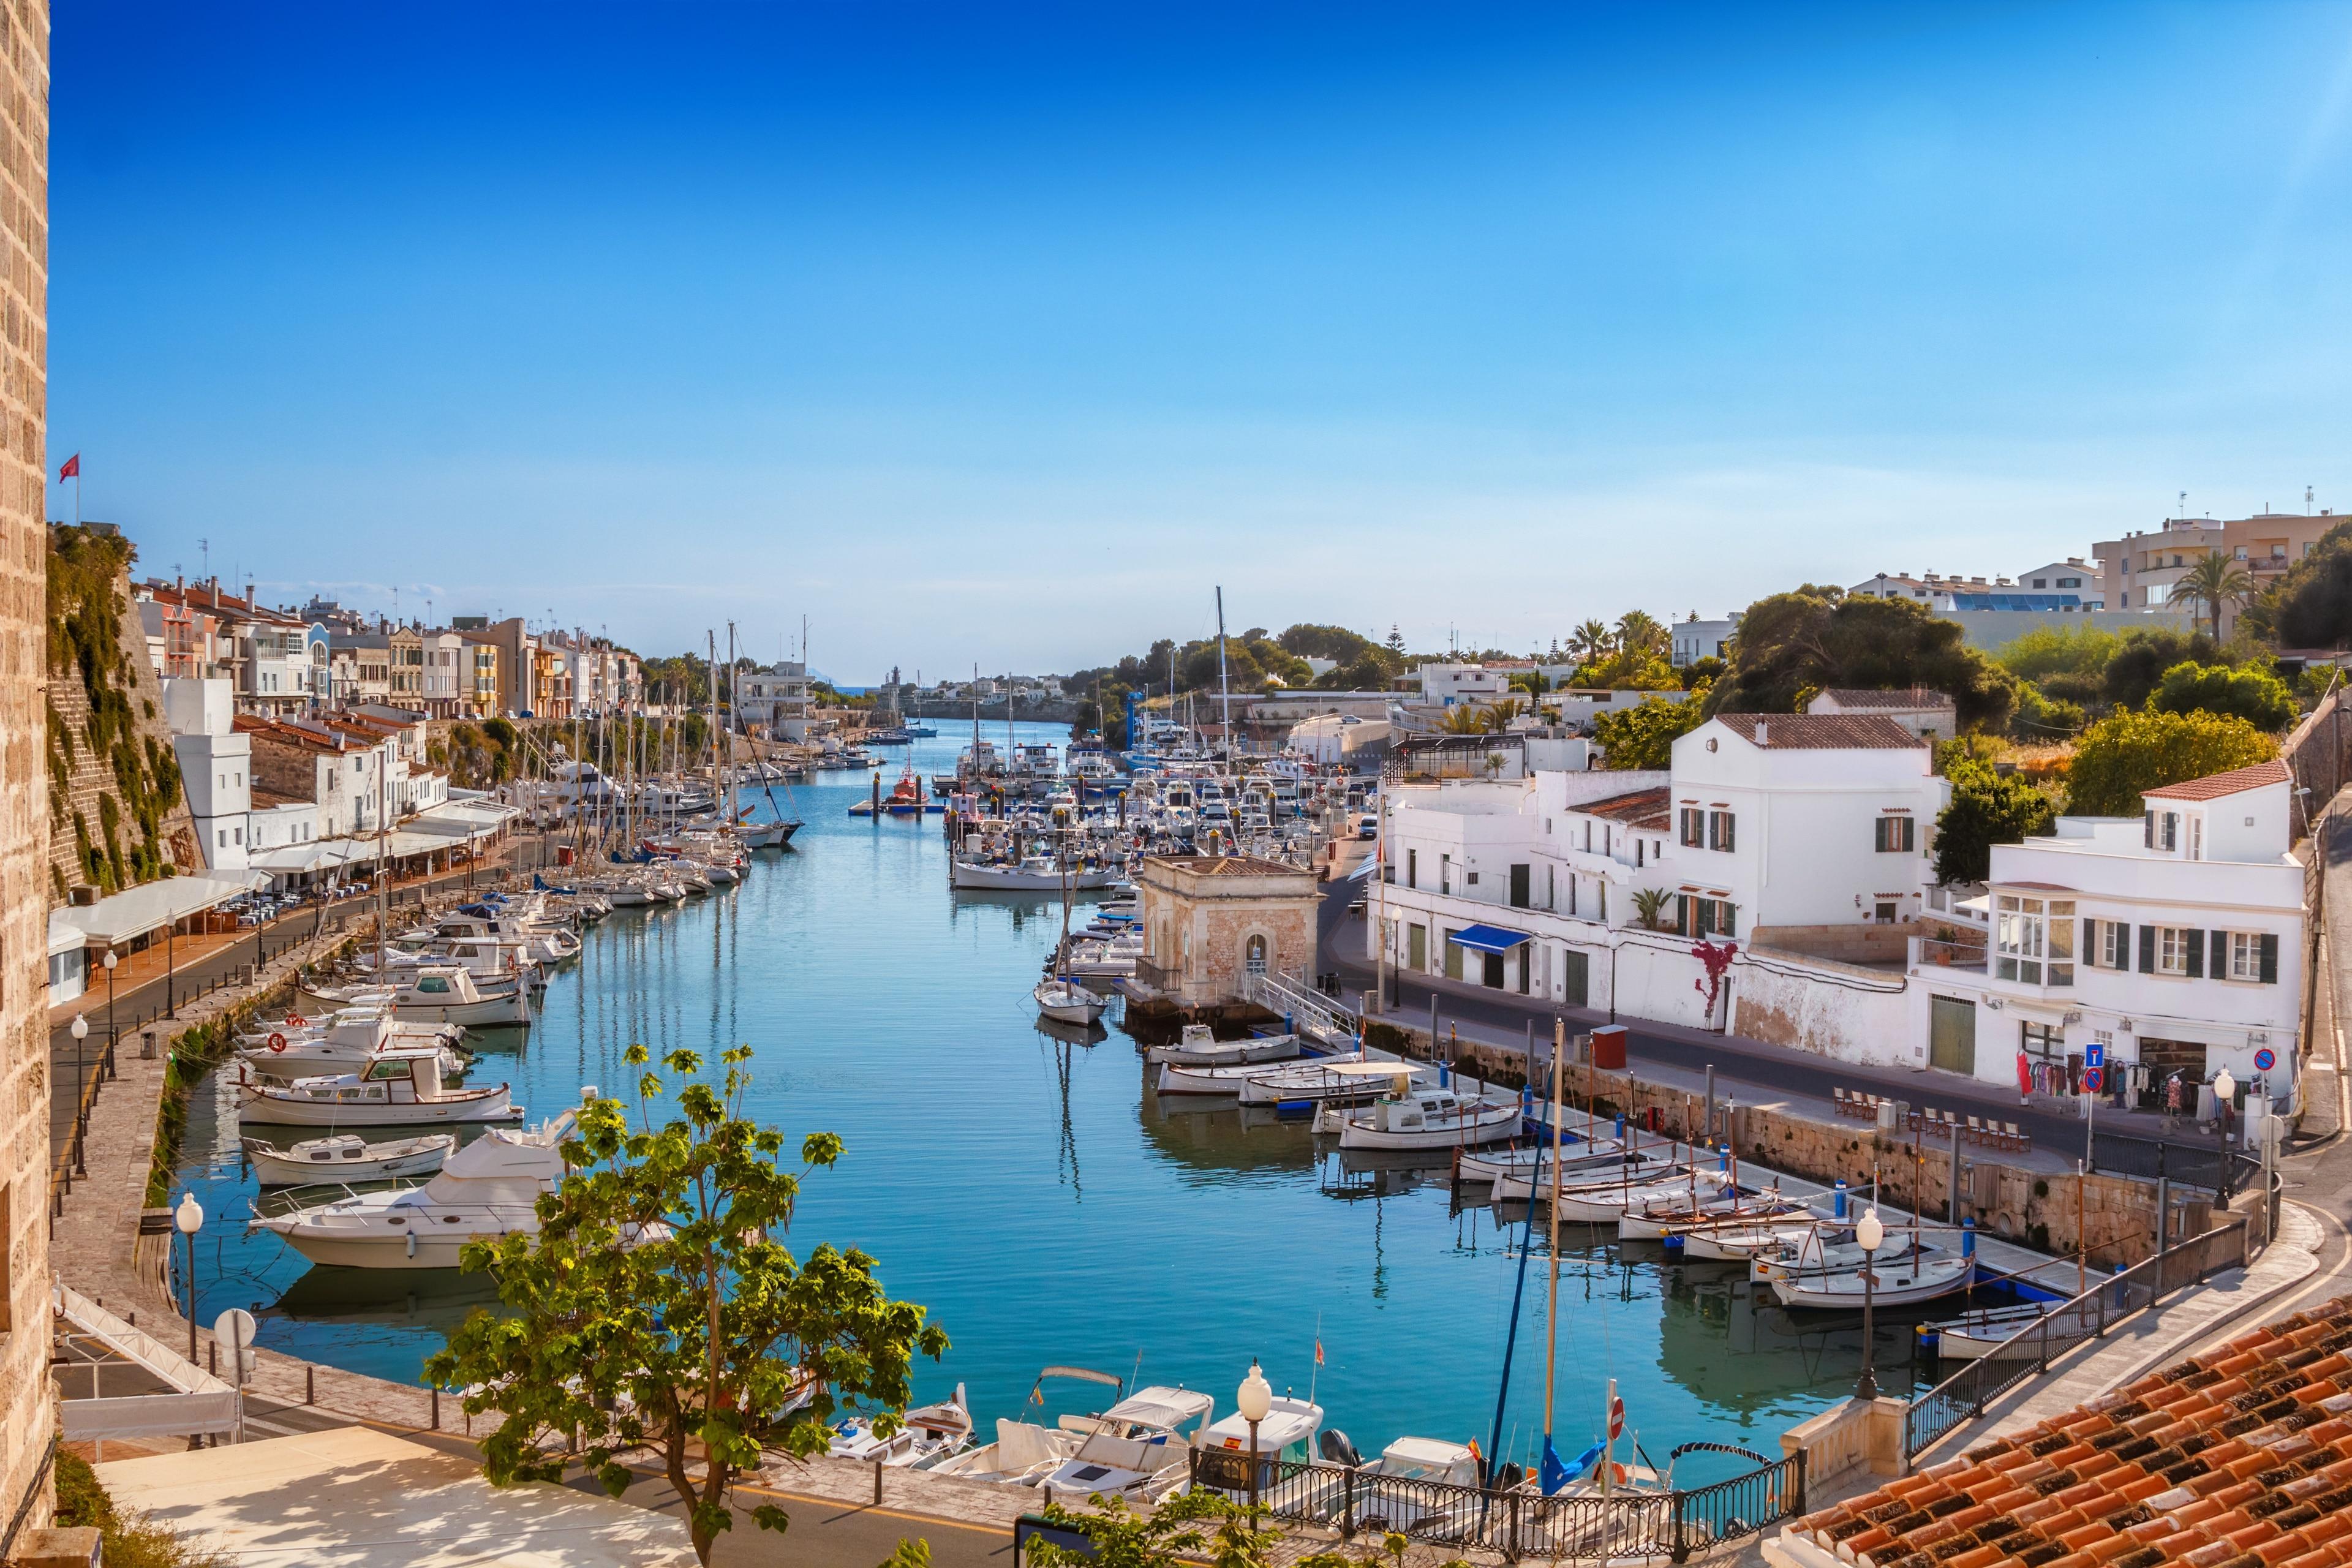 Ciutadella de Menorca, Balearic Islands, Spain